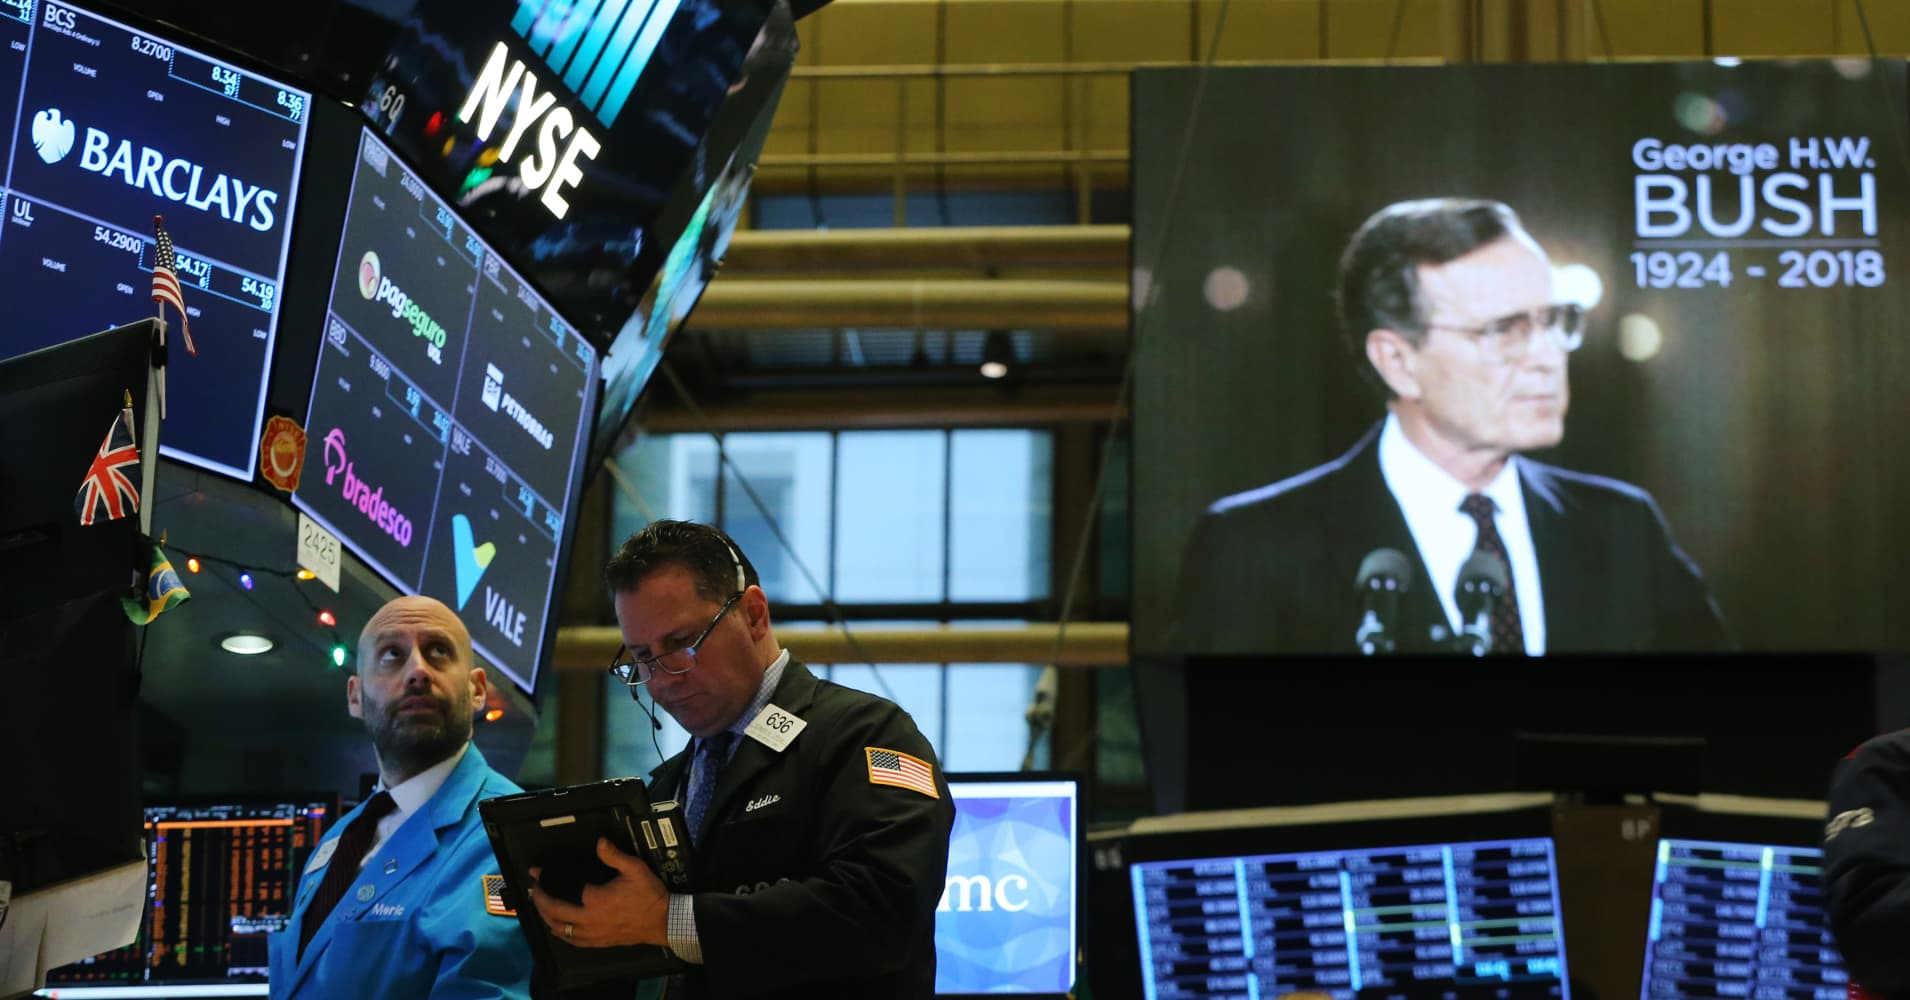 George HW Bush presided over third best S&P return for a GOP president